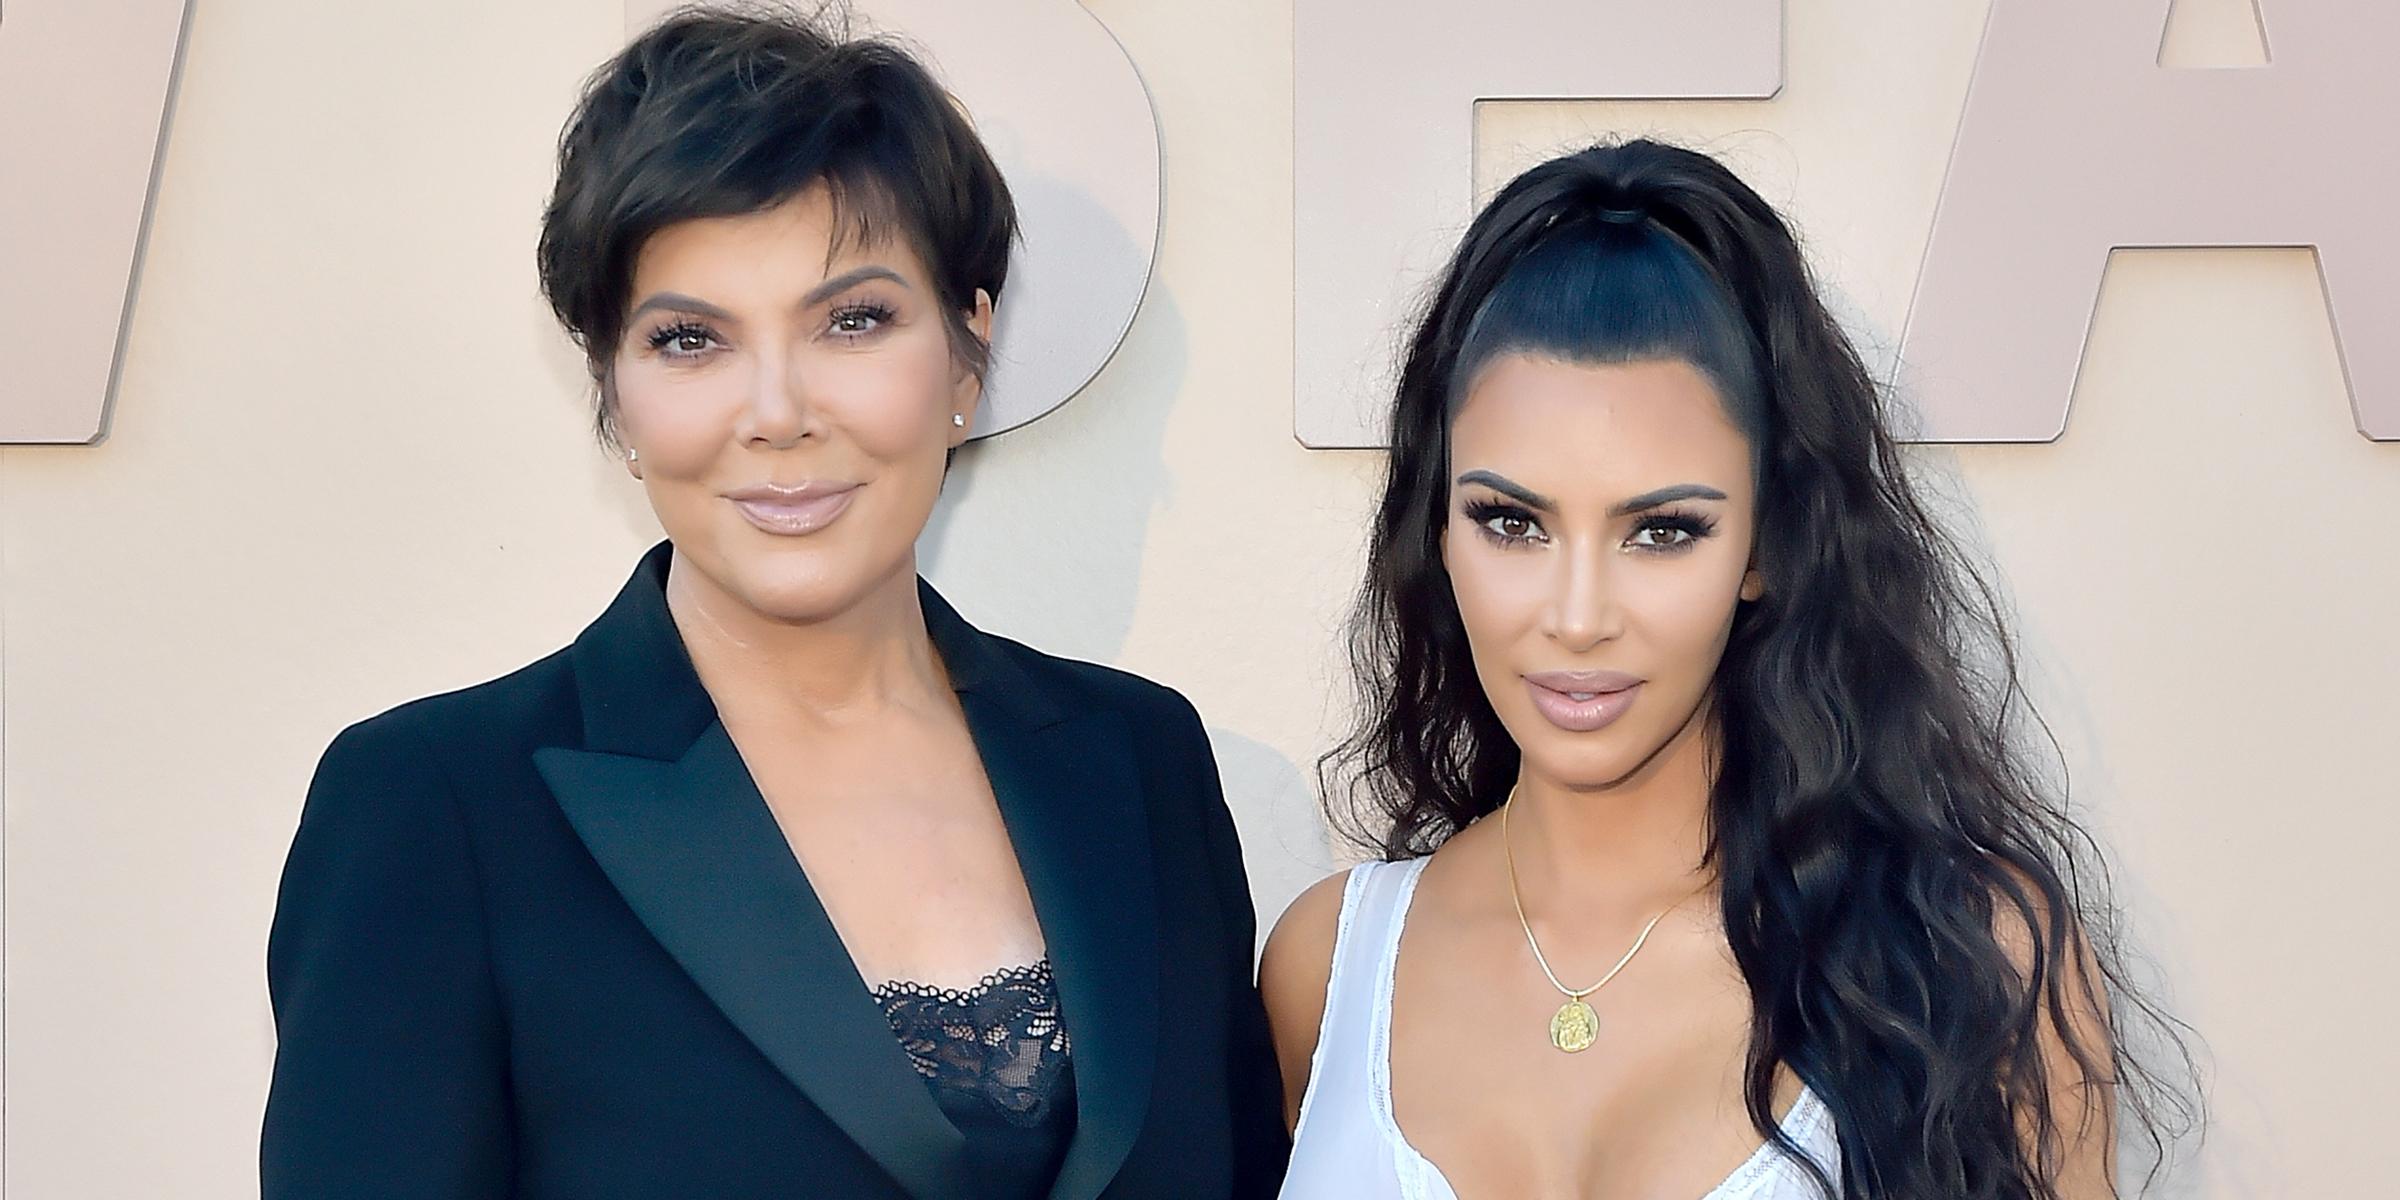 Superb Kris Jenner Looks Like Kim Kardashian In Instagram Photo Natural Hairstyles Runnerswayorg